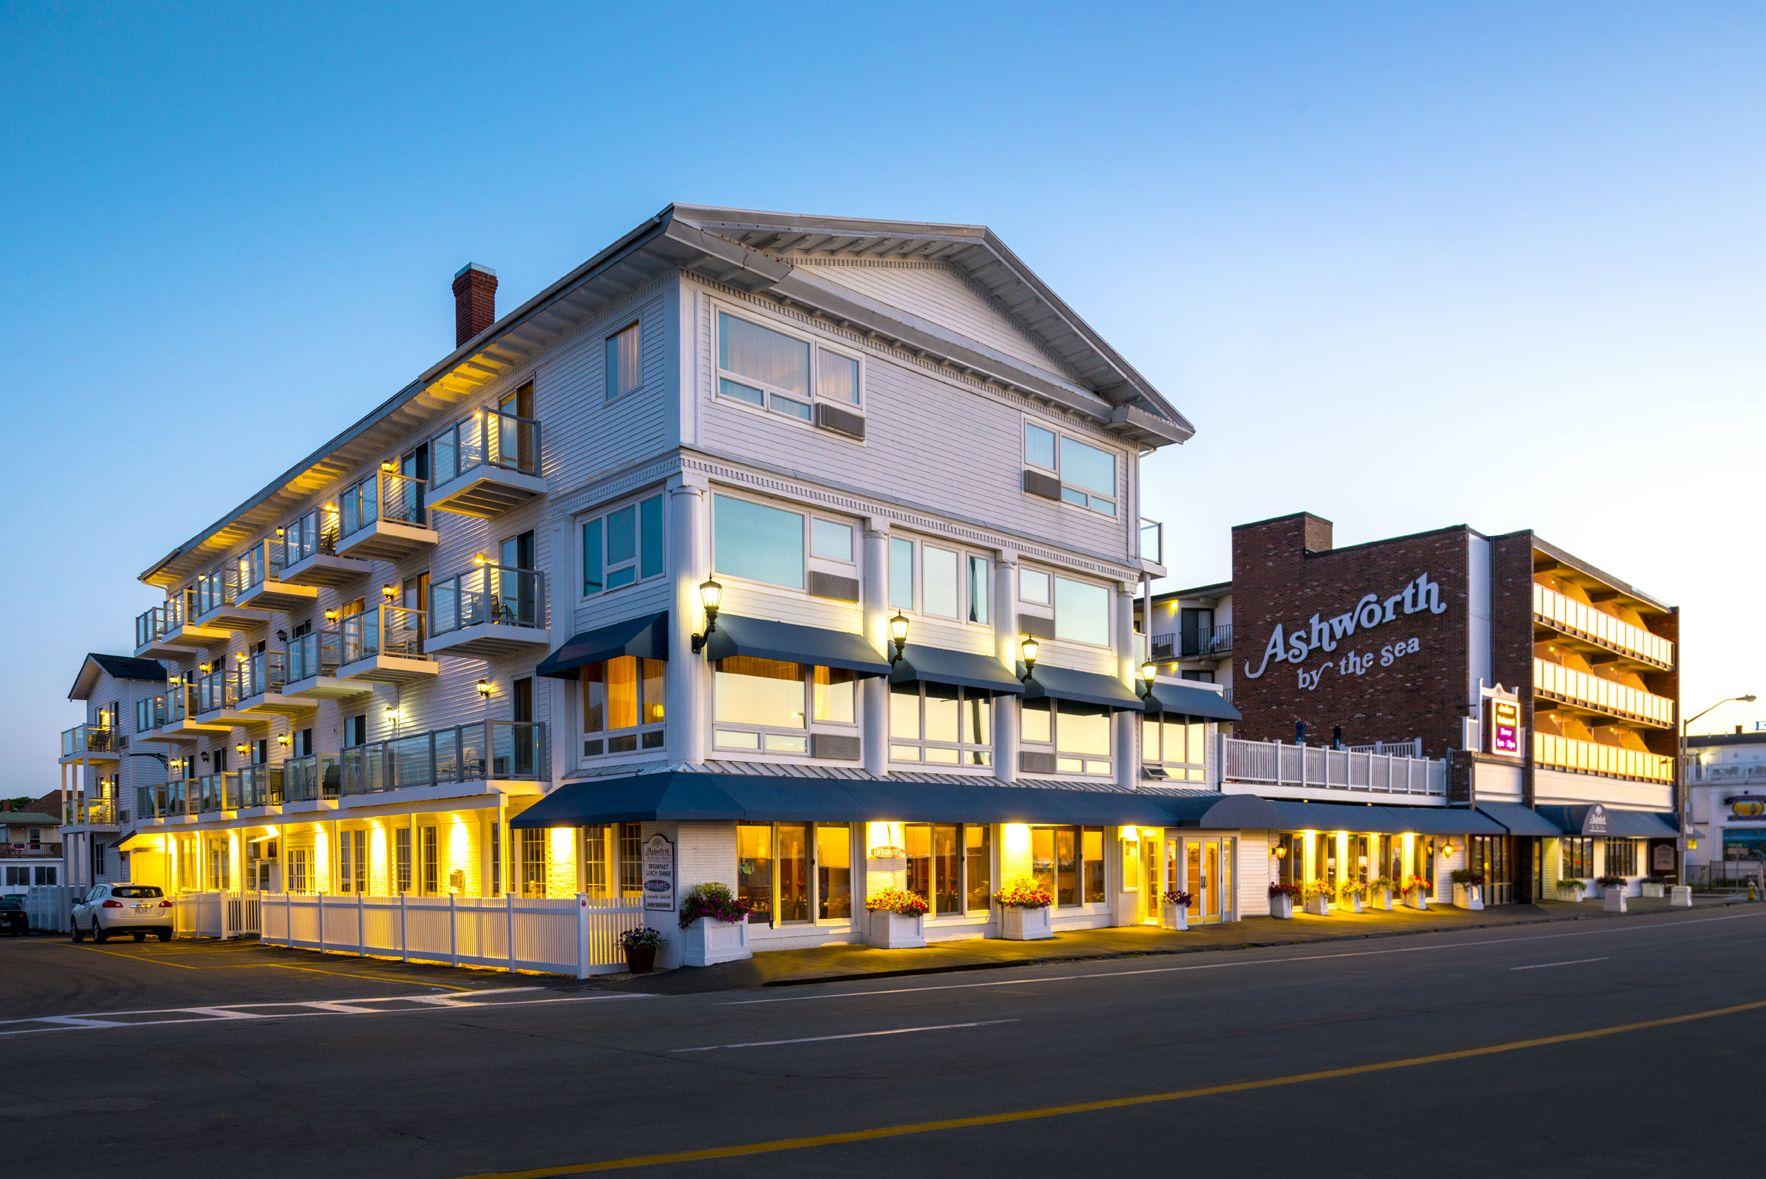 The Ashworth Hotel, Hampton Beach, N.H. - Digital Commonwealth